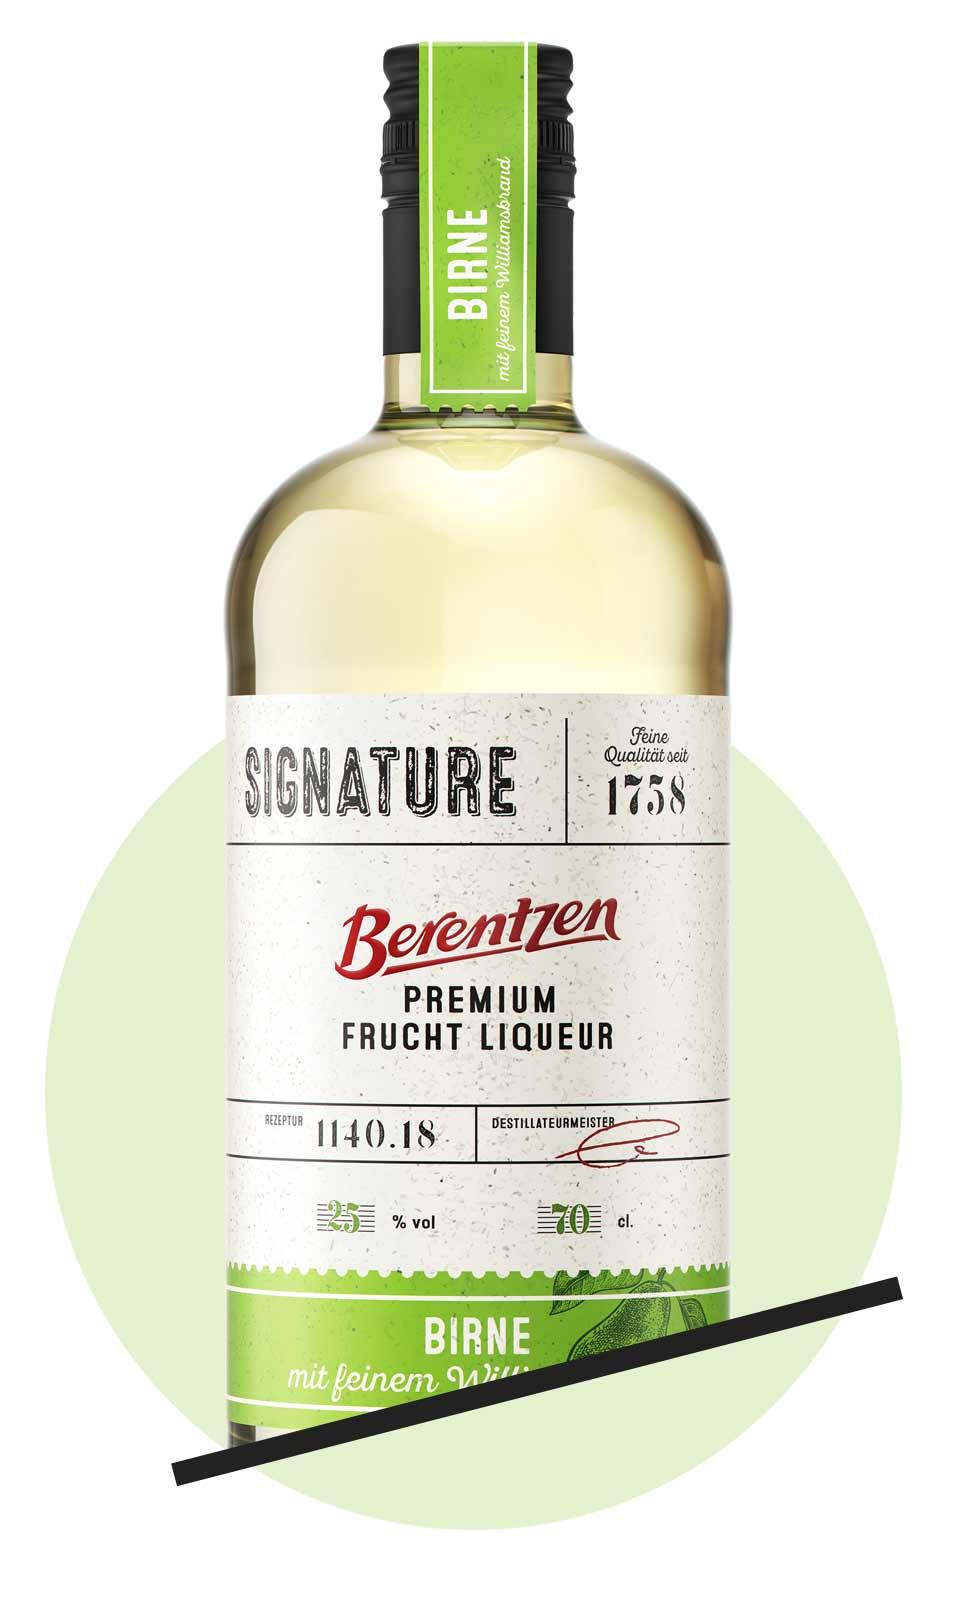 Berentzen Signature Premium Fruchtliqueur, Birne | Verkostungsrunde Spirituosen April 2019 | Mixology Magazin für Barkultur